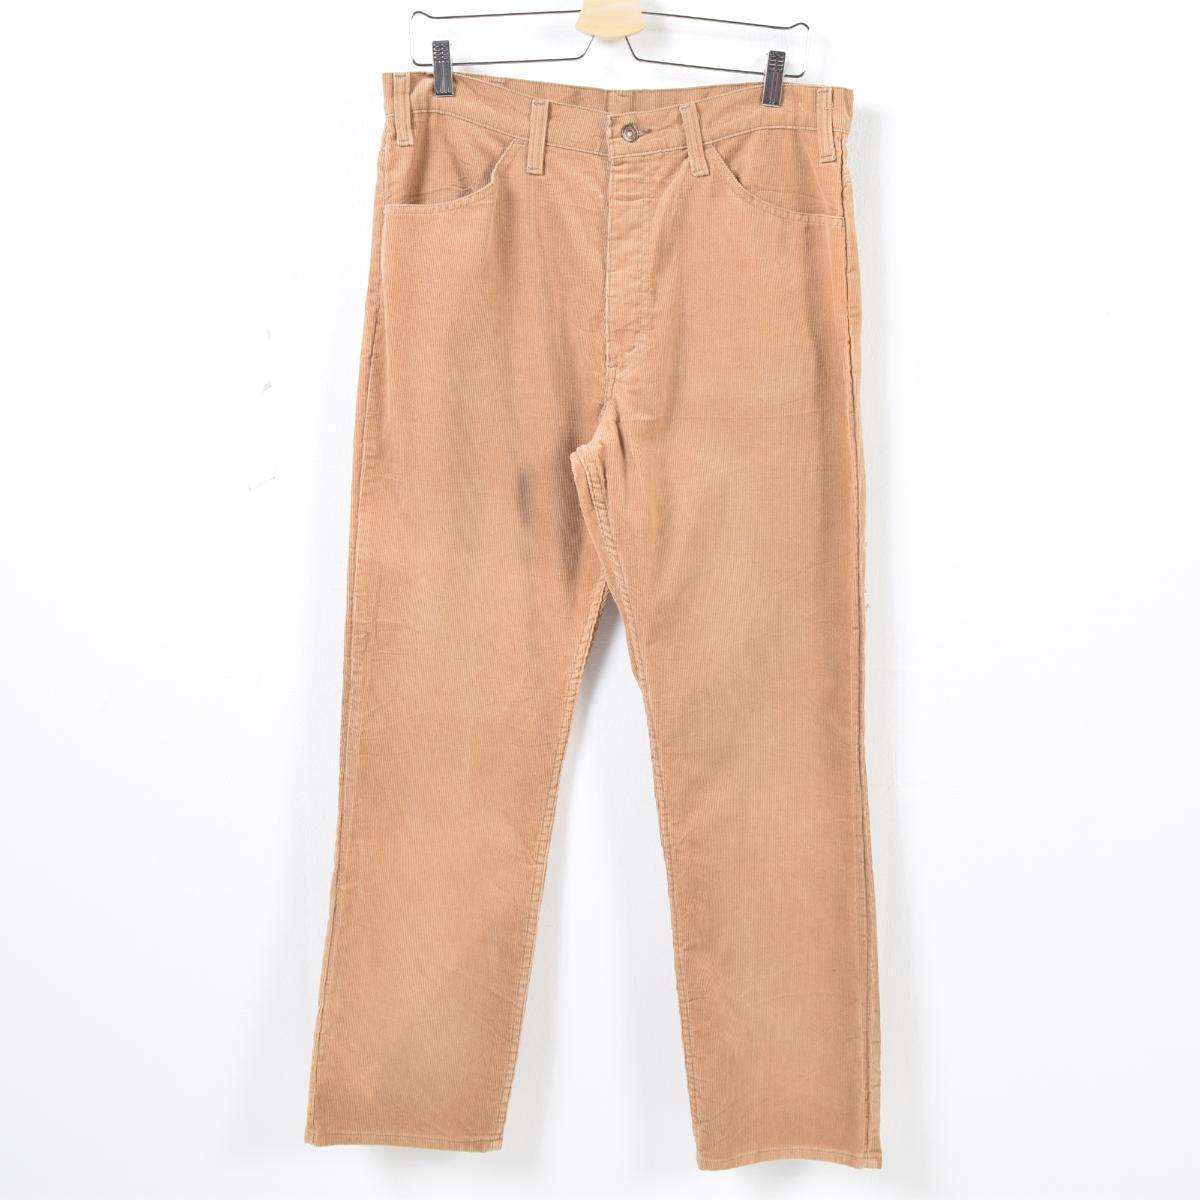 fda12f4d 80s Levis Levi's 519-1523 42TALON zip corduroy underwear men w34 vintage  /wak0453